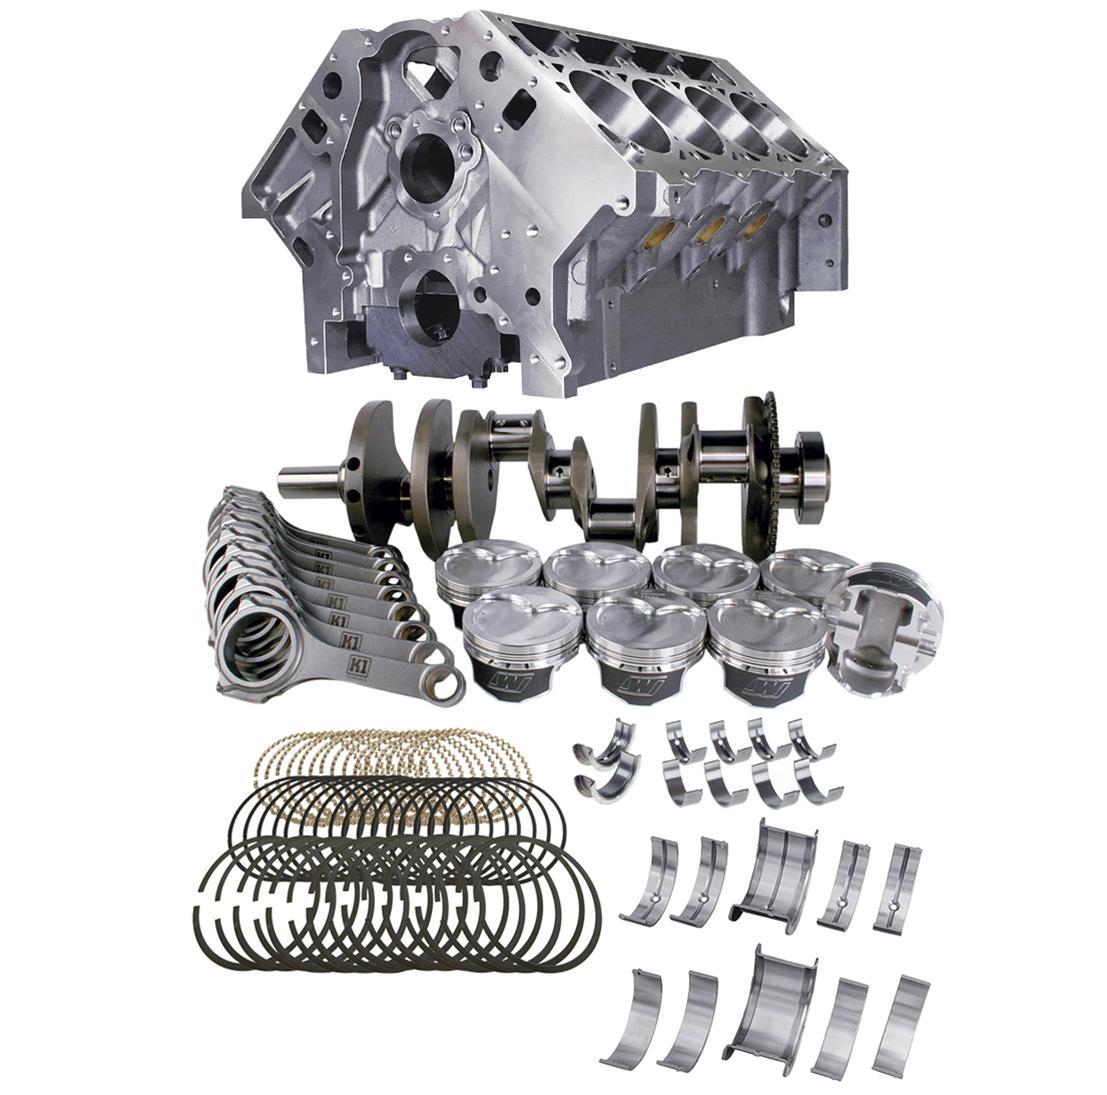 Parts Bin: New Summit Racing-Dart Short Block Kits for GM